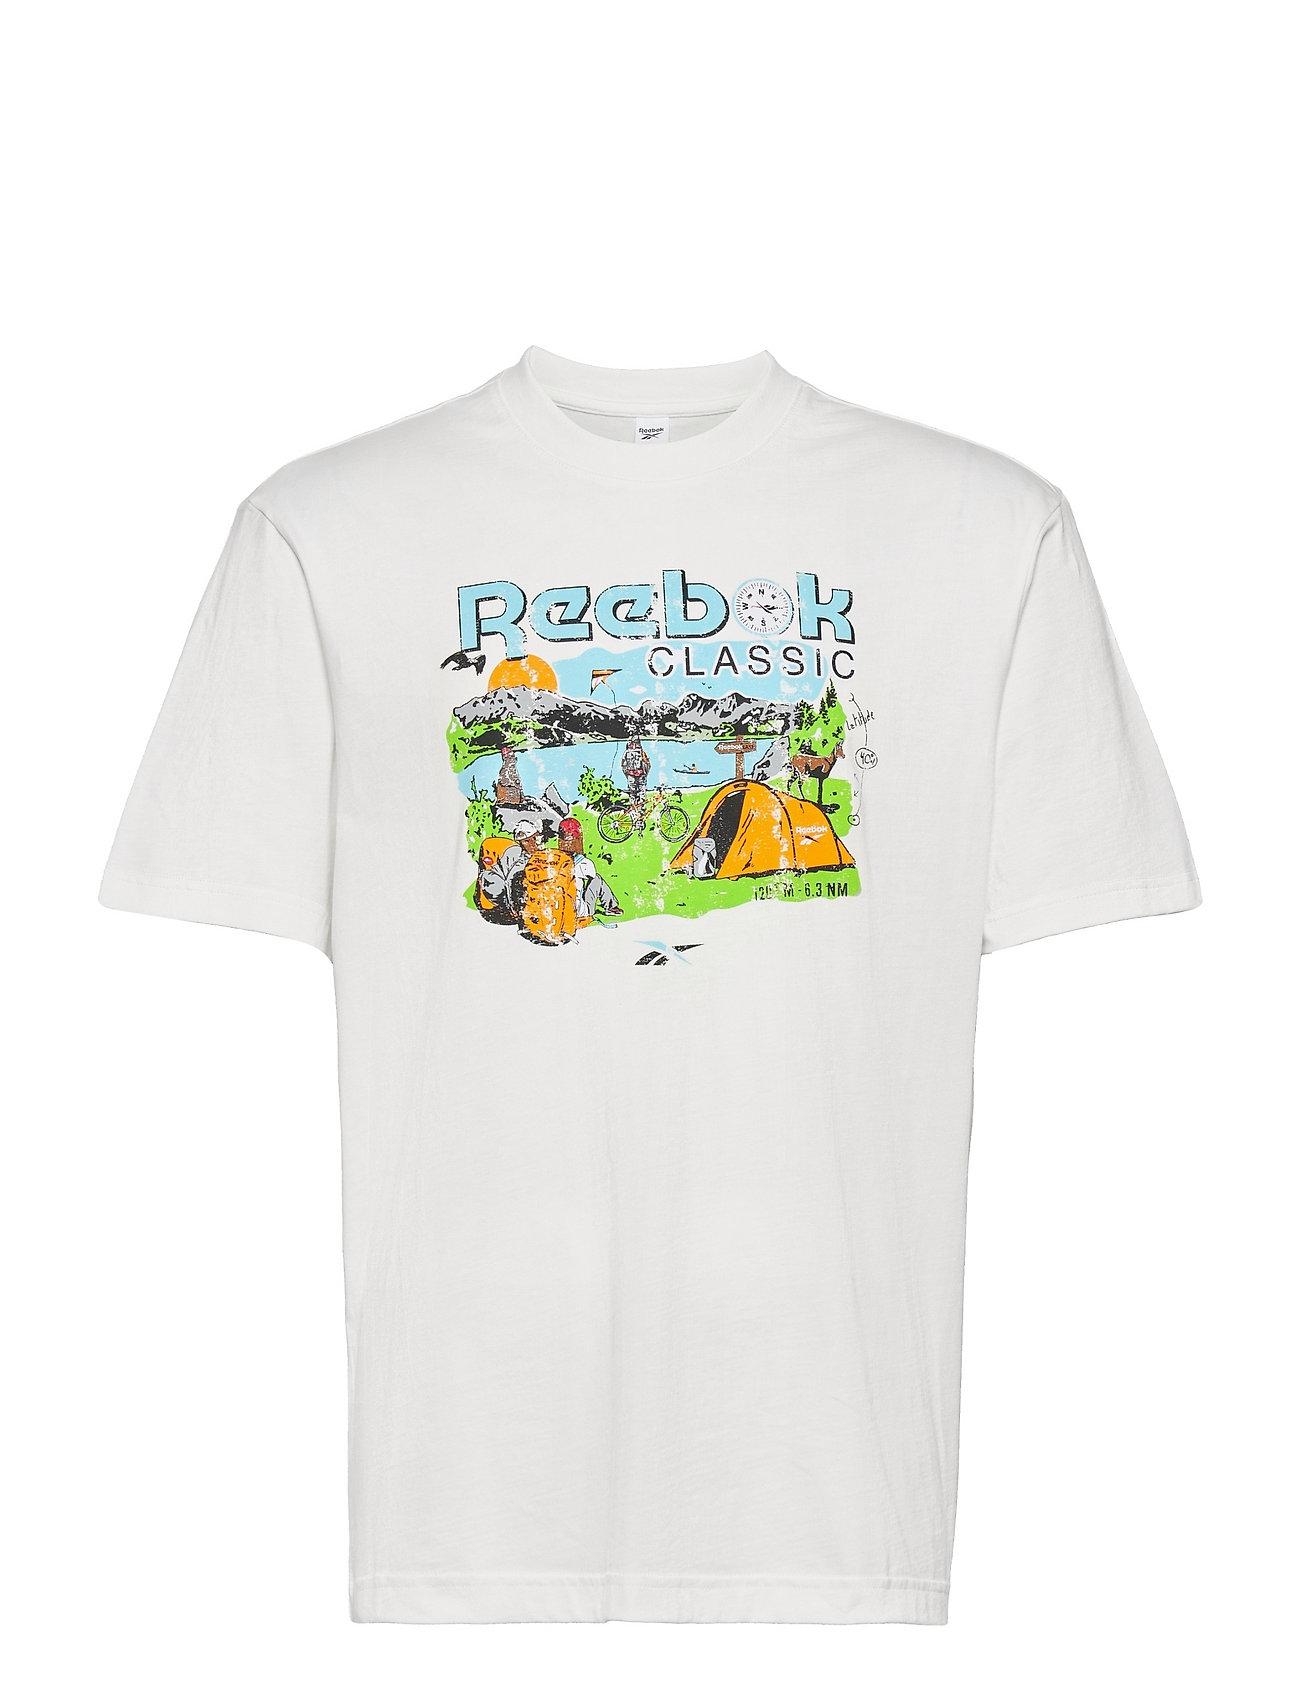 Image of Cl Intl Tee West T-shirt Hvid Reebok Classics (3534657605)